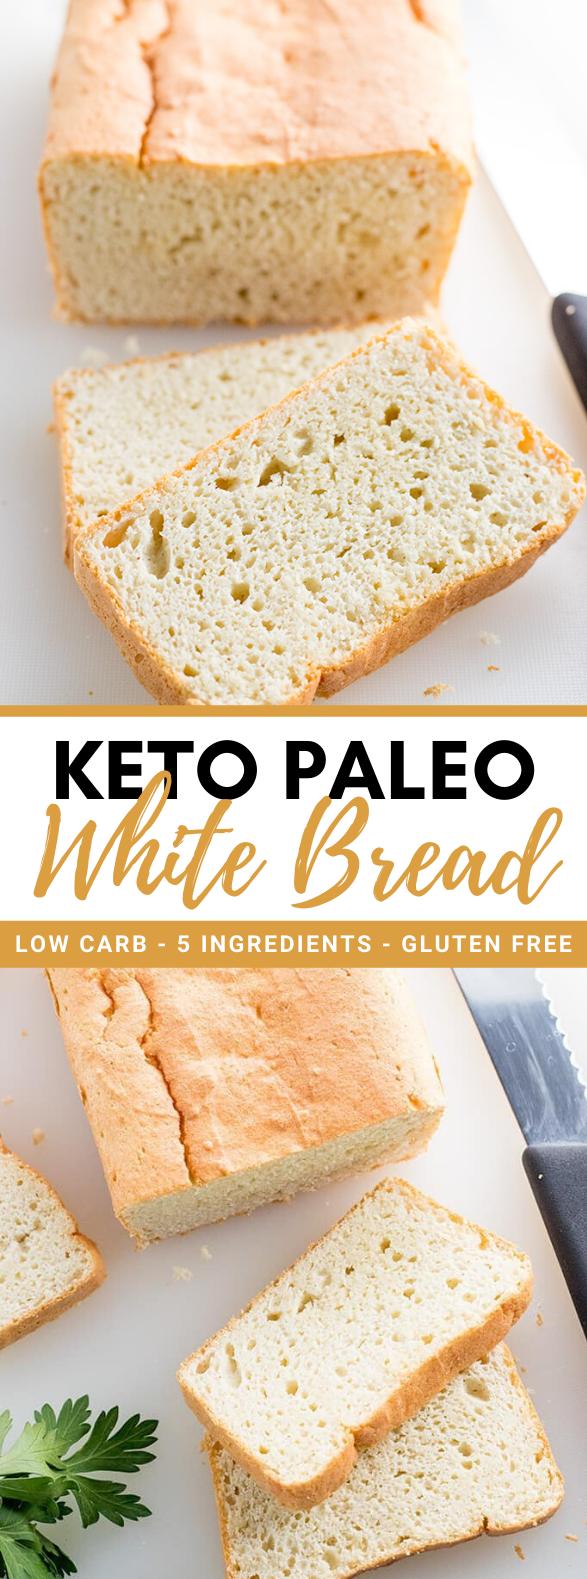 EASY PALEO KETO BREAD RECIPE – 5 INGREDIENTS #healthy #diet